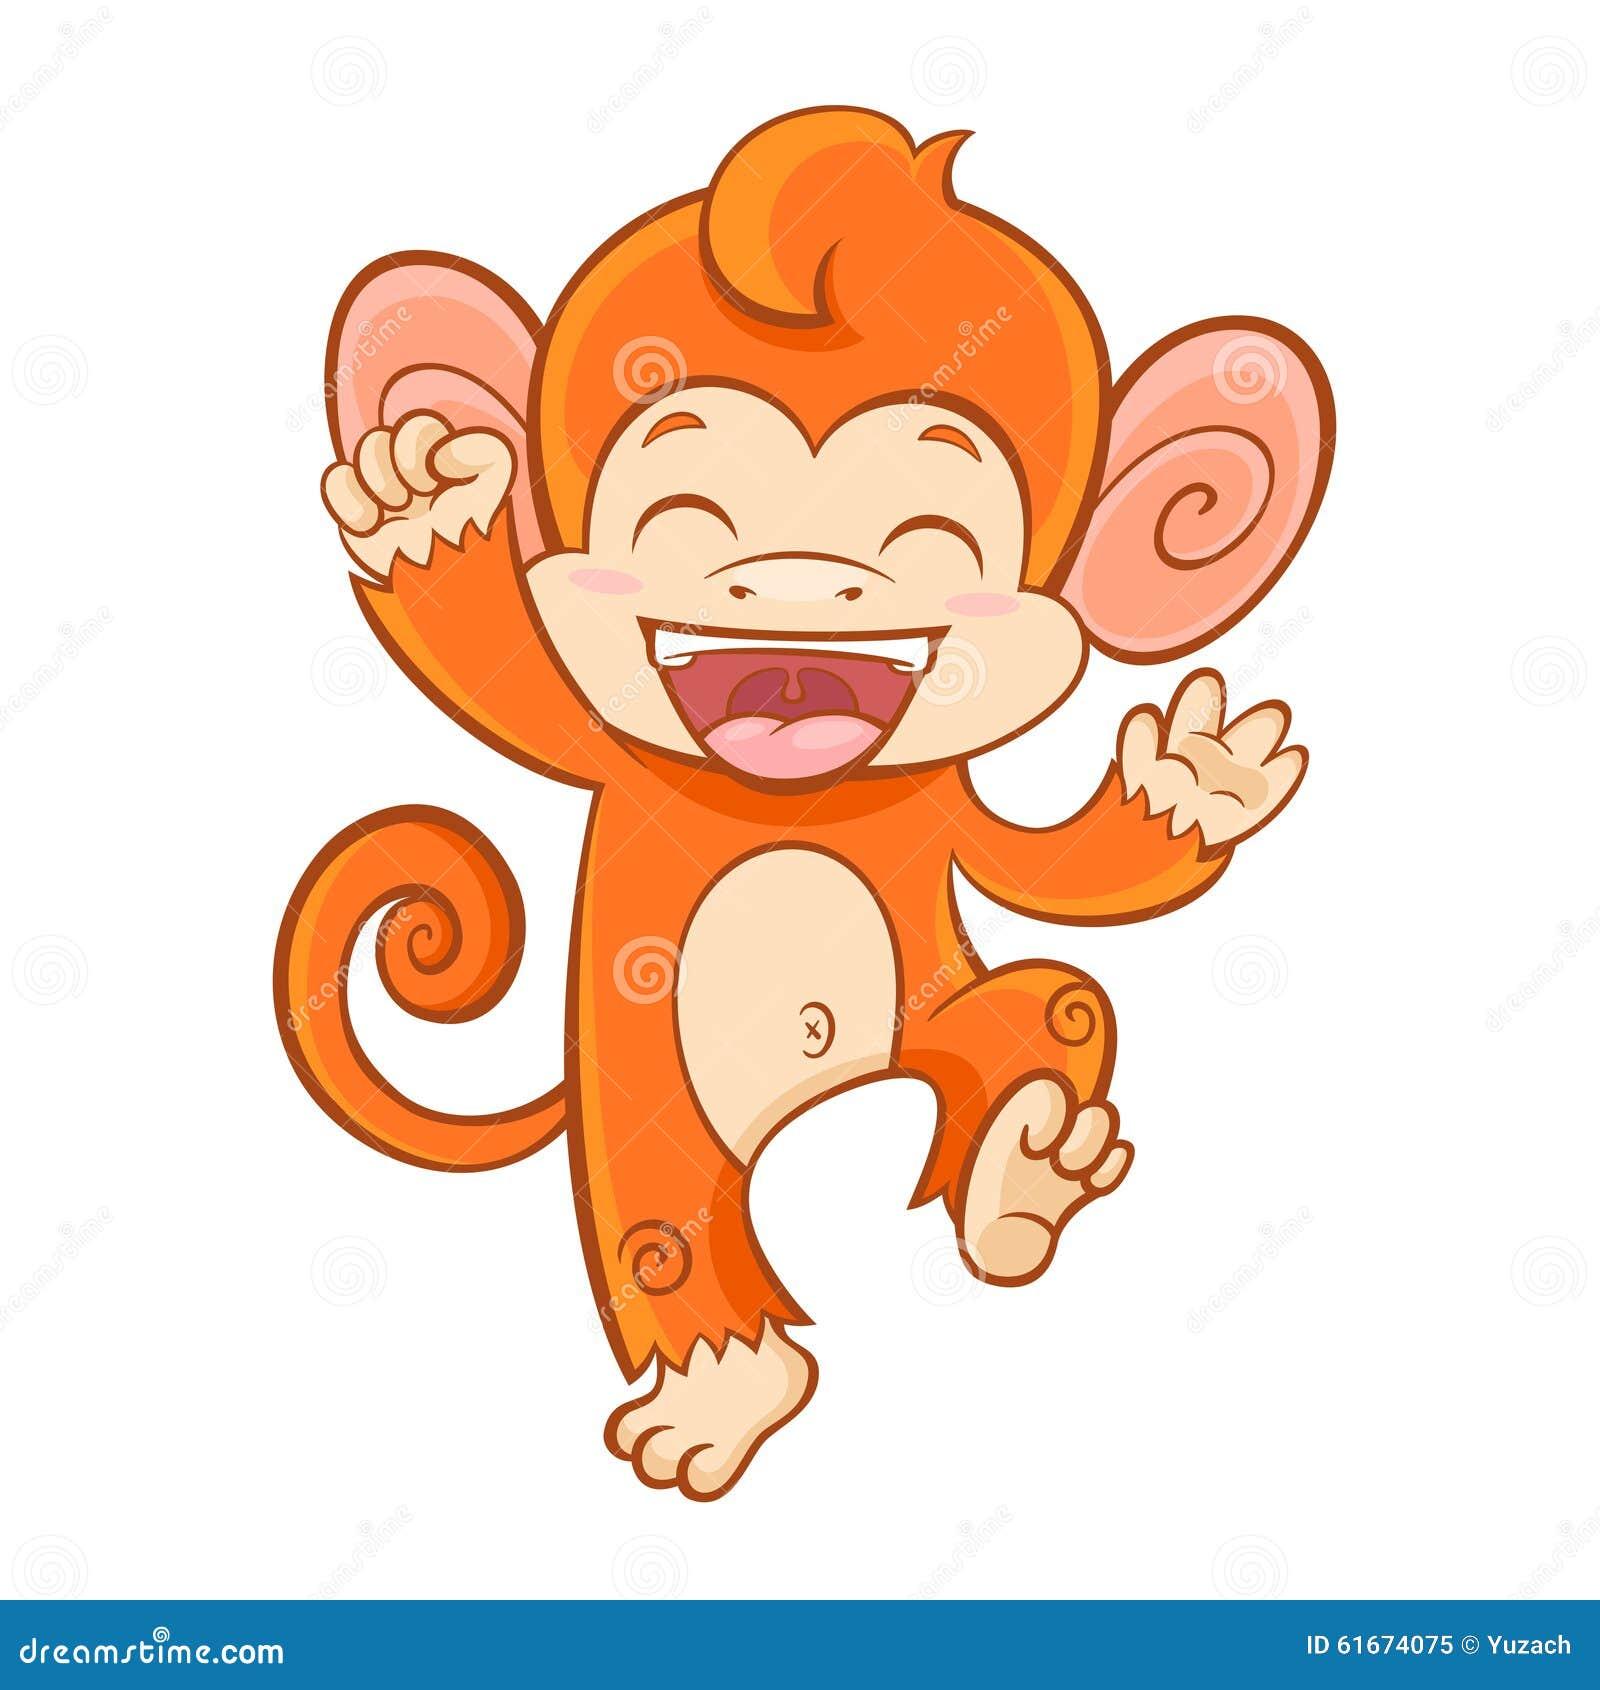 7 monkeys cartoon white background